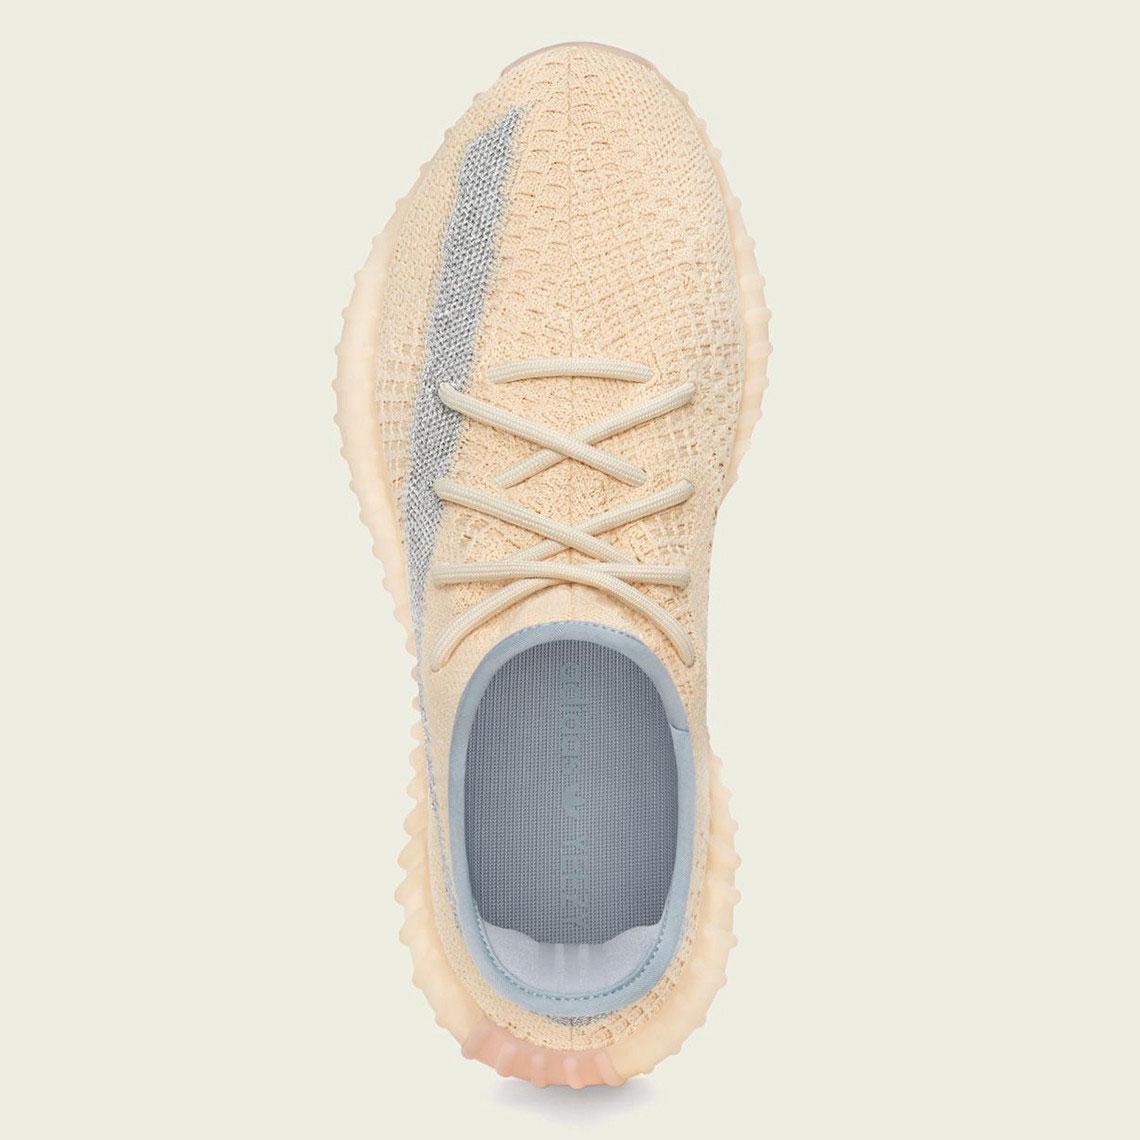 adidas-Yeezy-Boost-350-v2-Linen-4